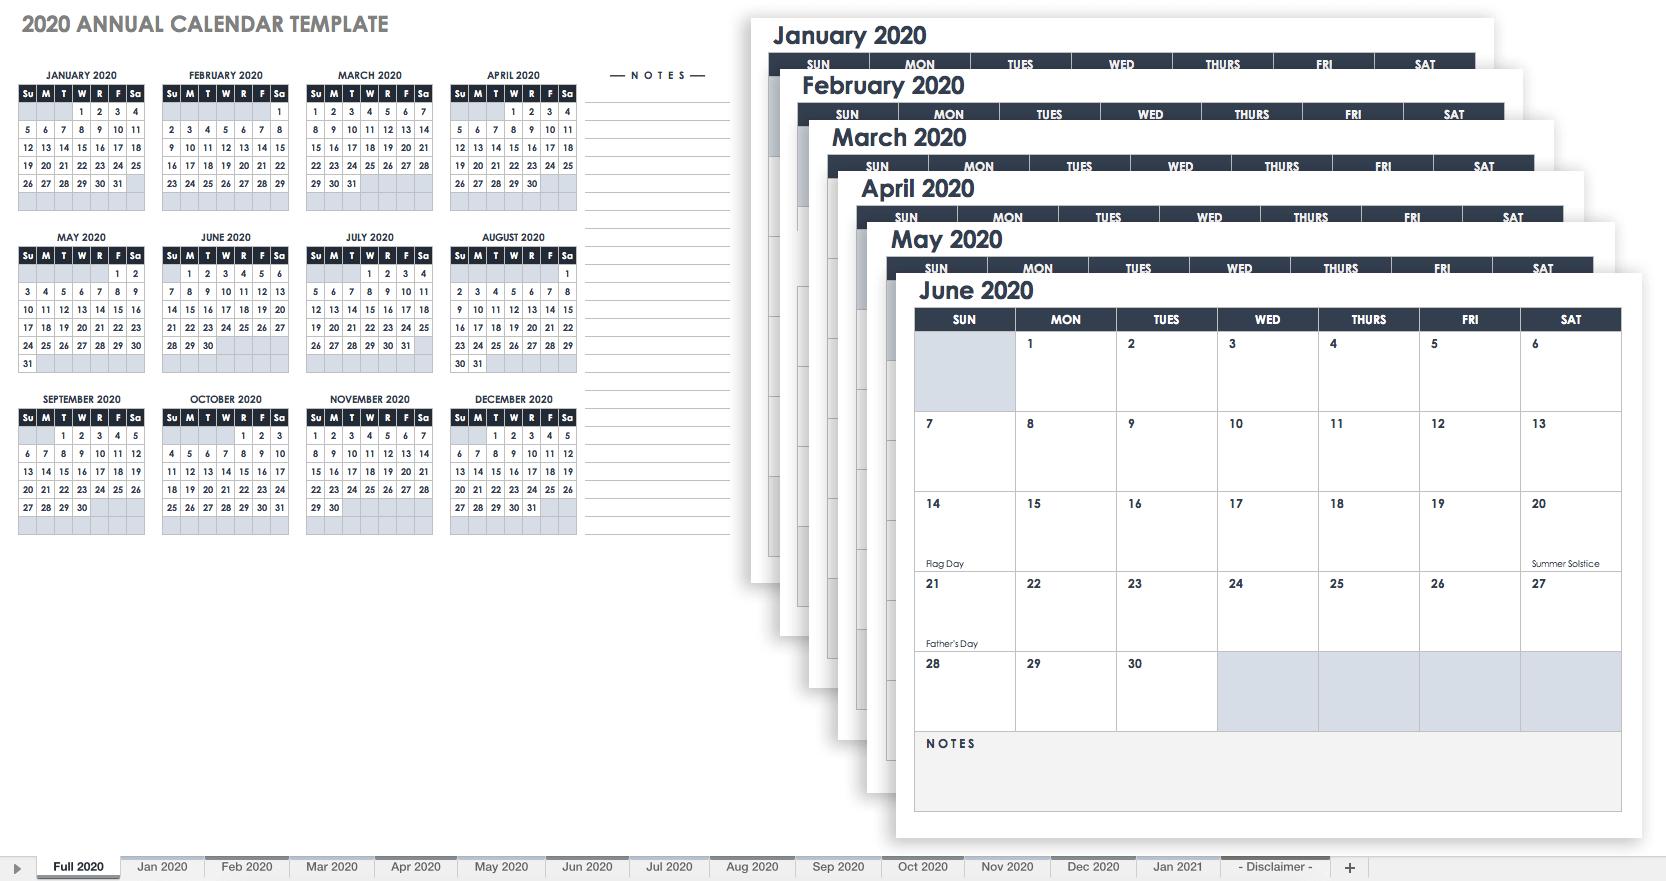 28 Free Time Management Worksheets | Smartsheet - Time Management Forms Free Printable